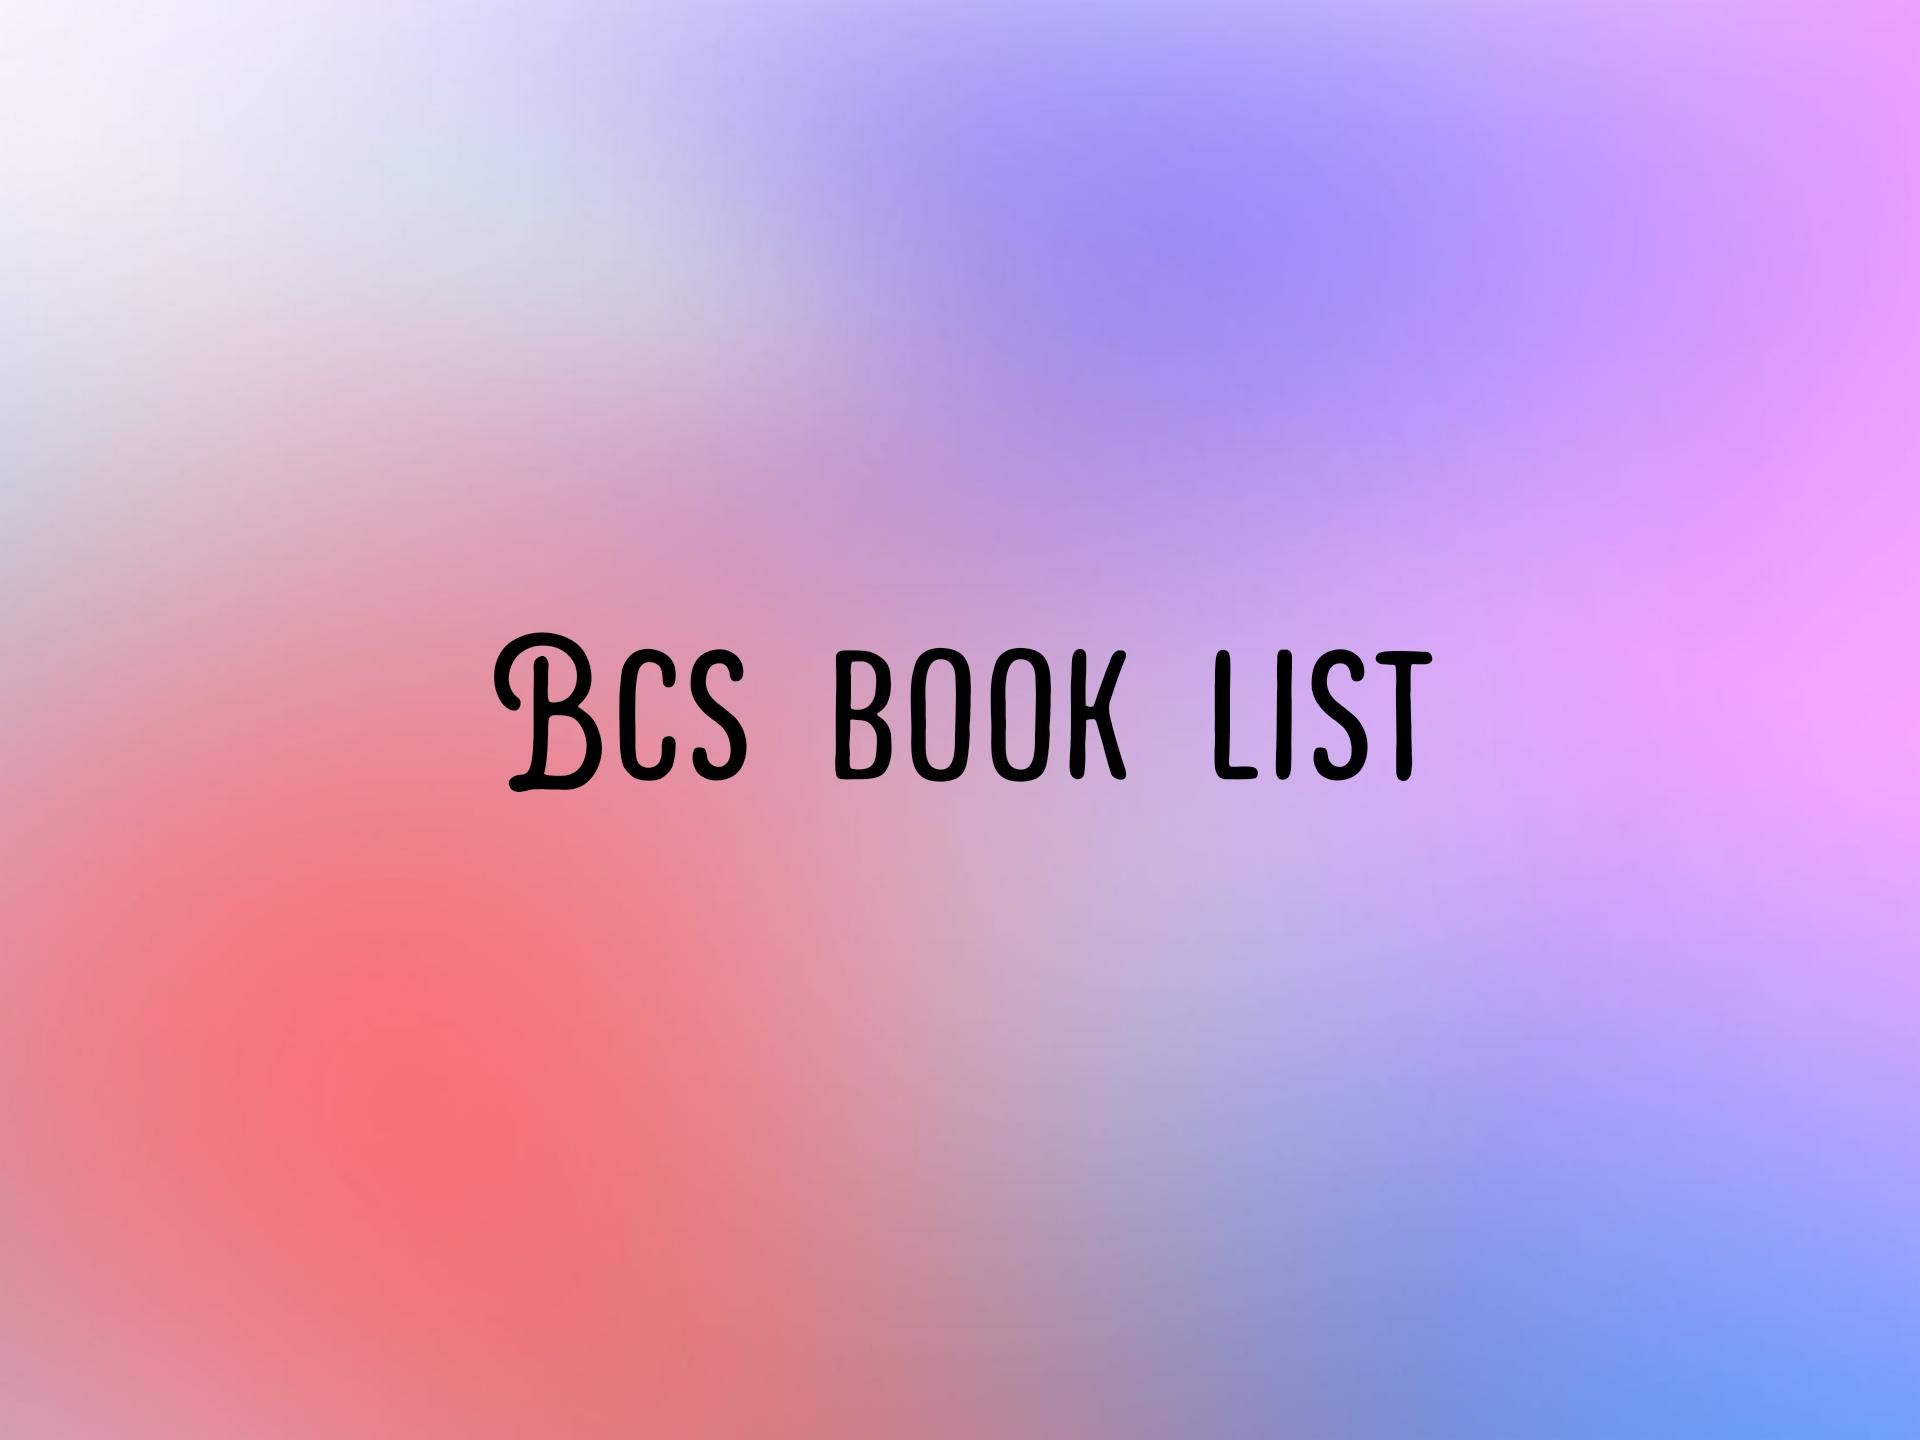 bcs book list, bcs book list price, bcs book list pdf download,  বিসিএস বুক লিস্ট, বিসিএস বুক লিস্ট প্রাইস